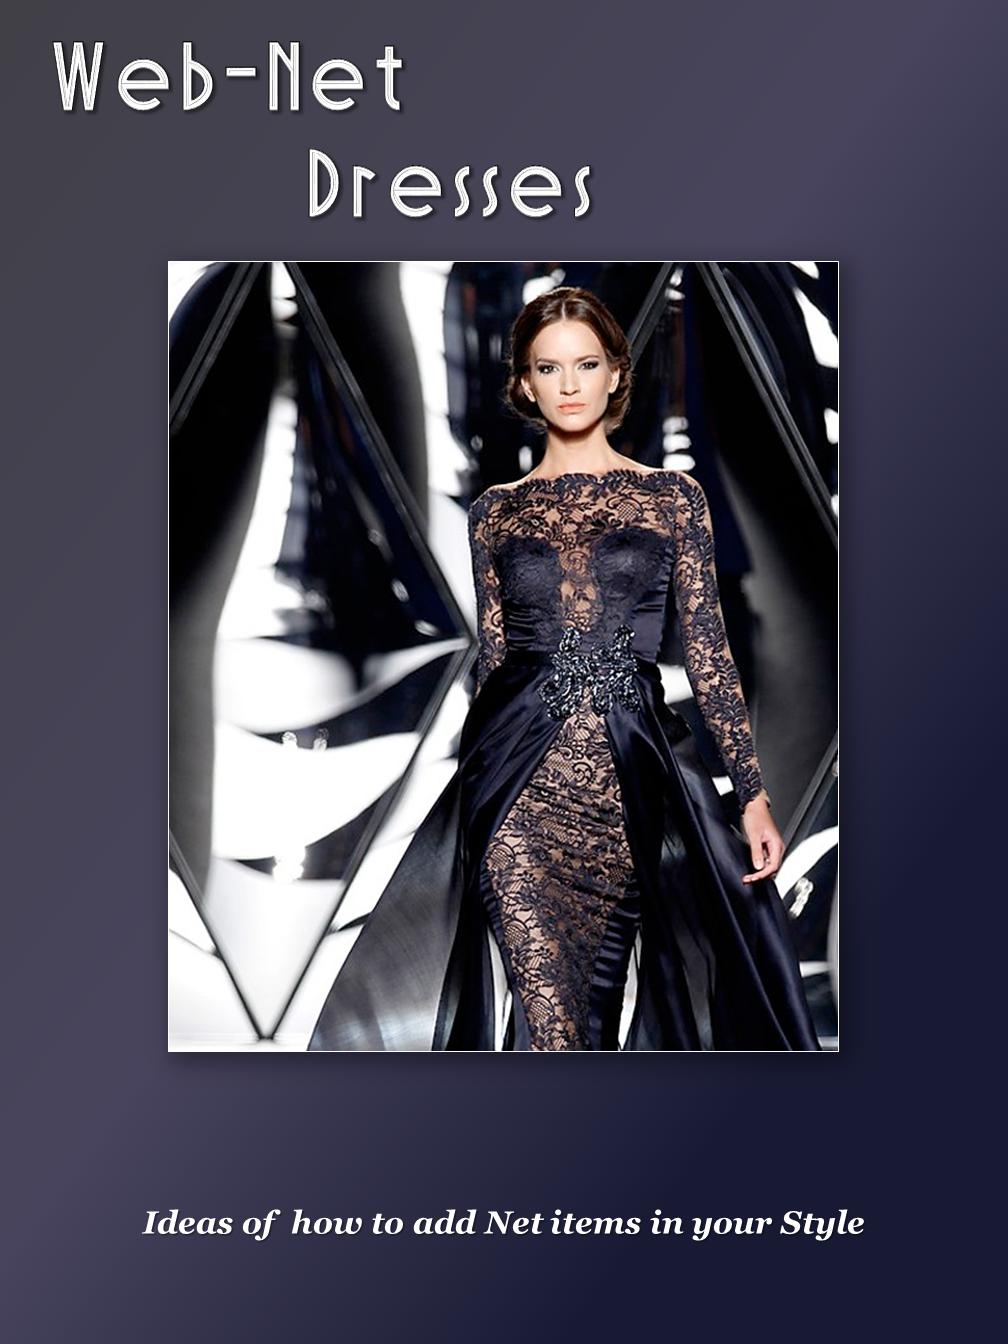 Web-Net Dresses